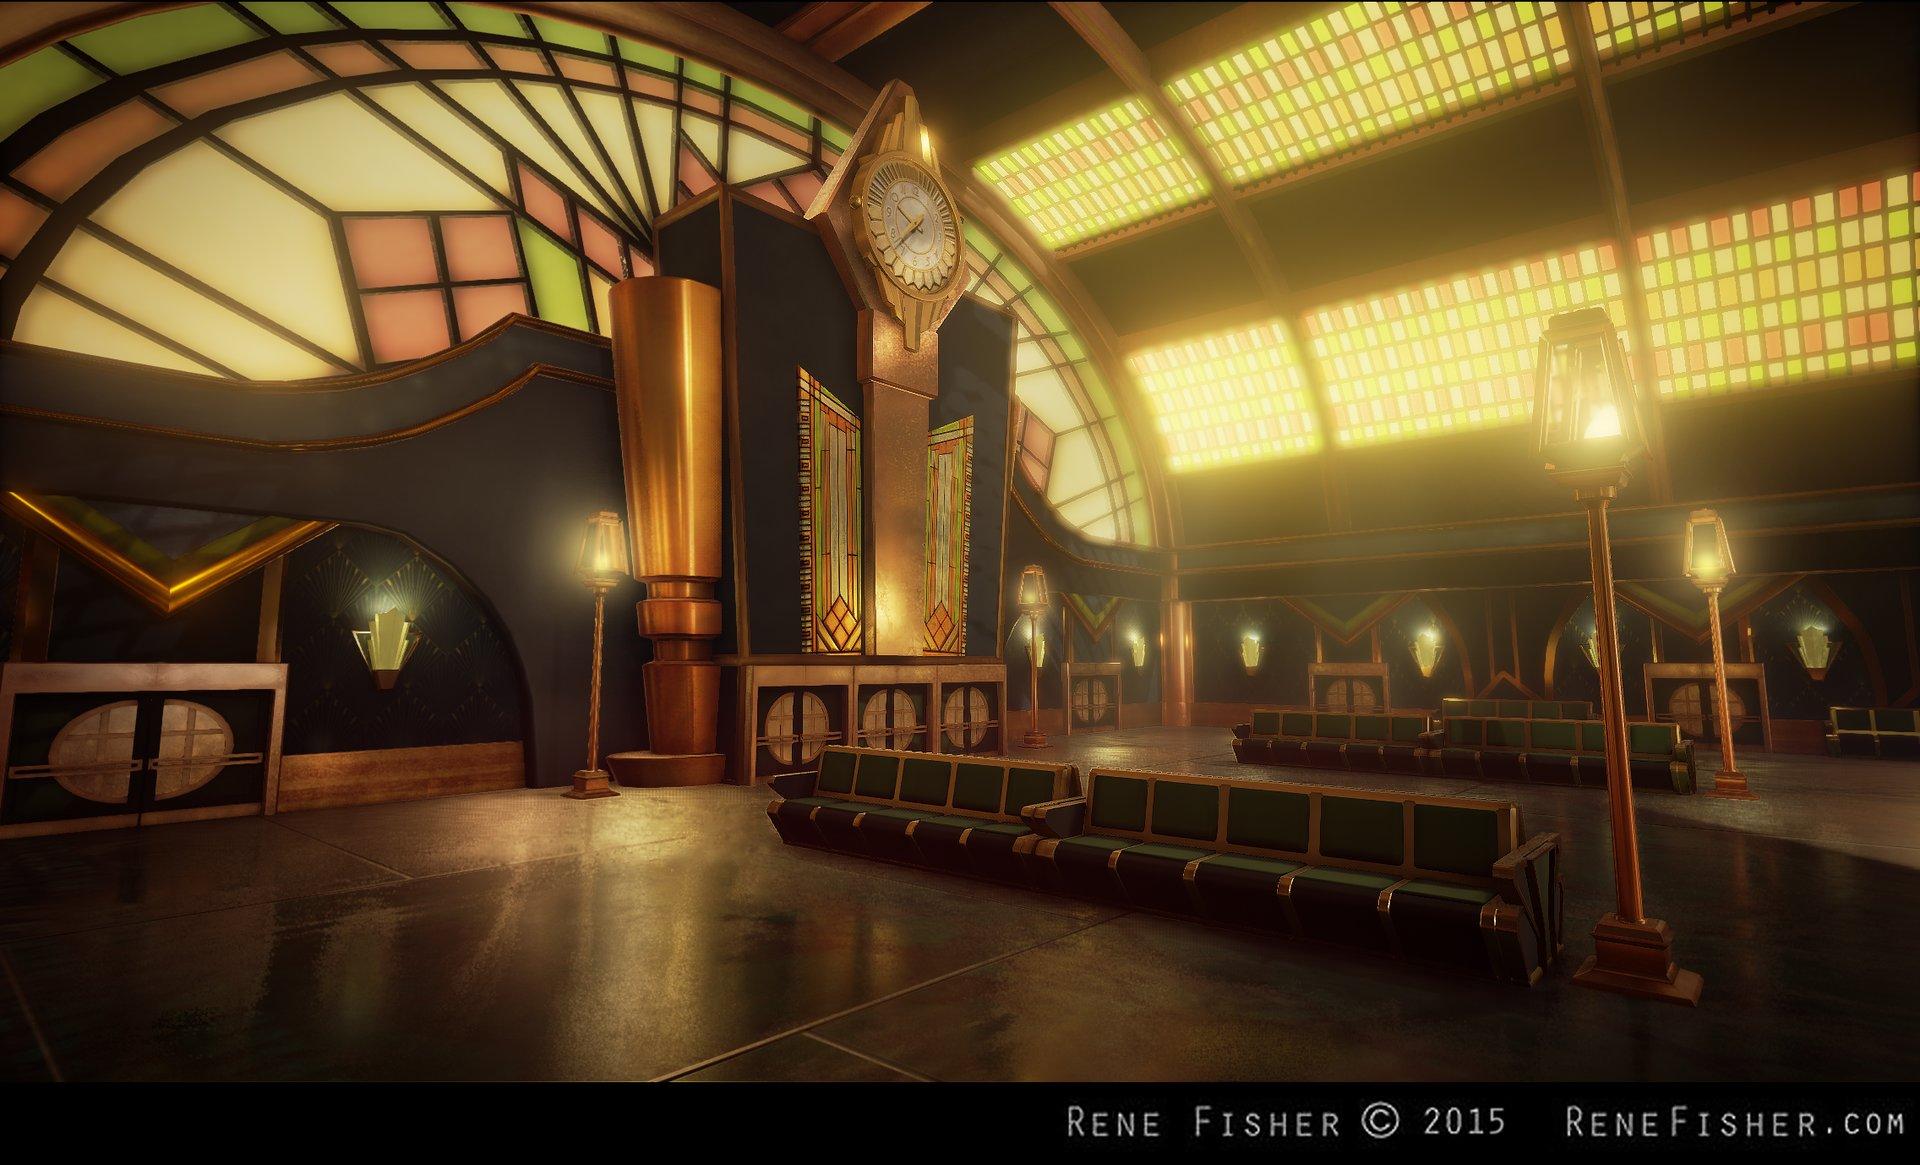 Rene fisher art deco train station for Art deco train interior